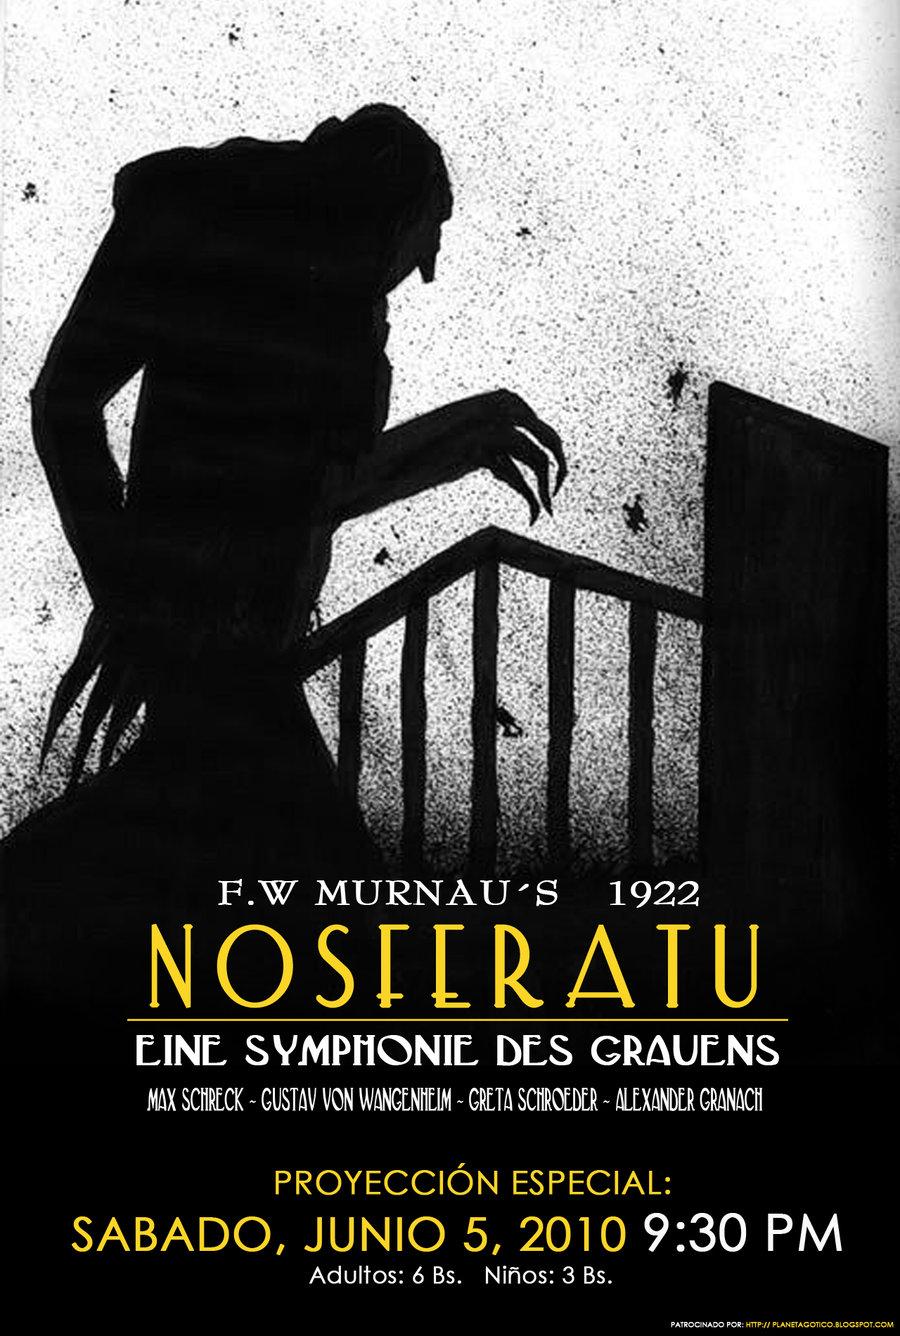 http://3.bp.blogspot.com/-g4isDesyskE/UaIeNgk6mGI/AAAAAAAAK-E/tPQ0WqLwTHQ/s1600/Nosferatu+00.jpg